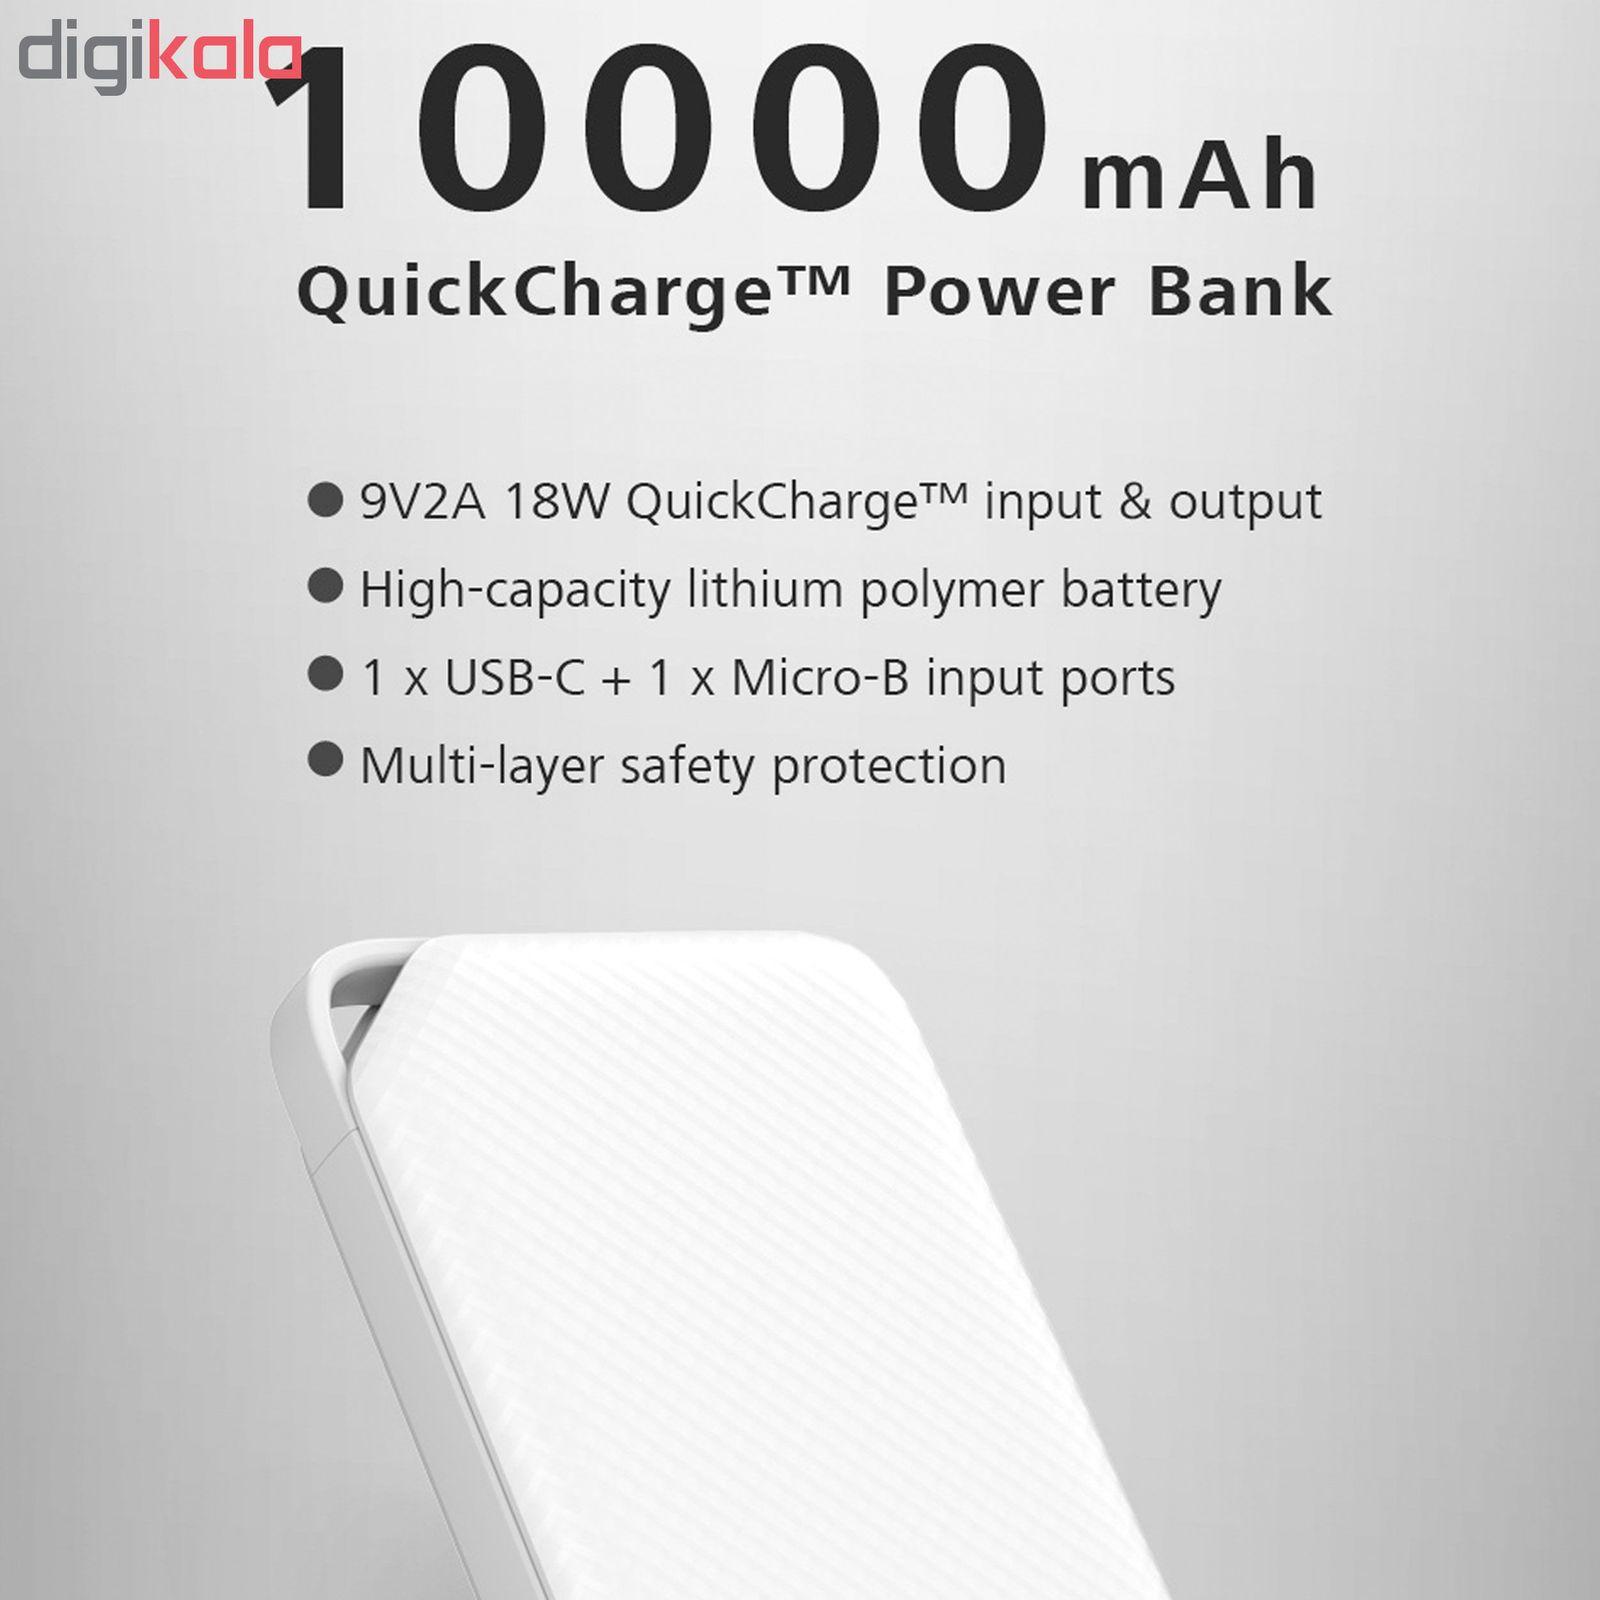 شارژر همراه هوآوی مدل Honor AP08L ظرفیت 10000 میلی آمپر ساعت main 1 14